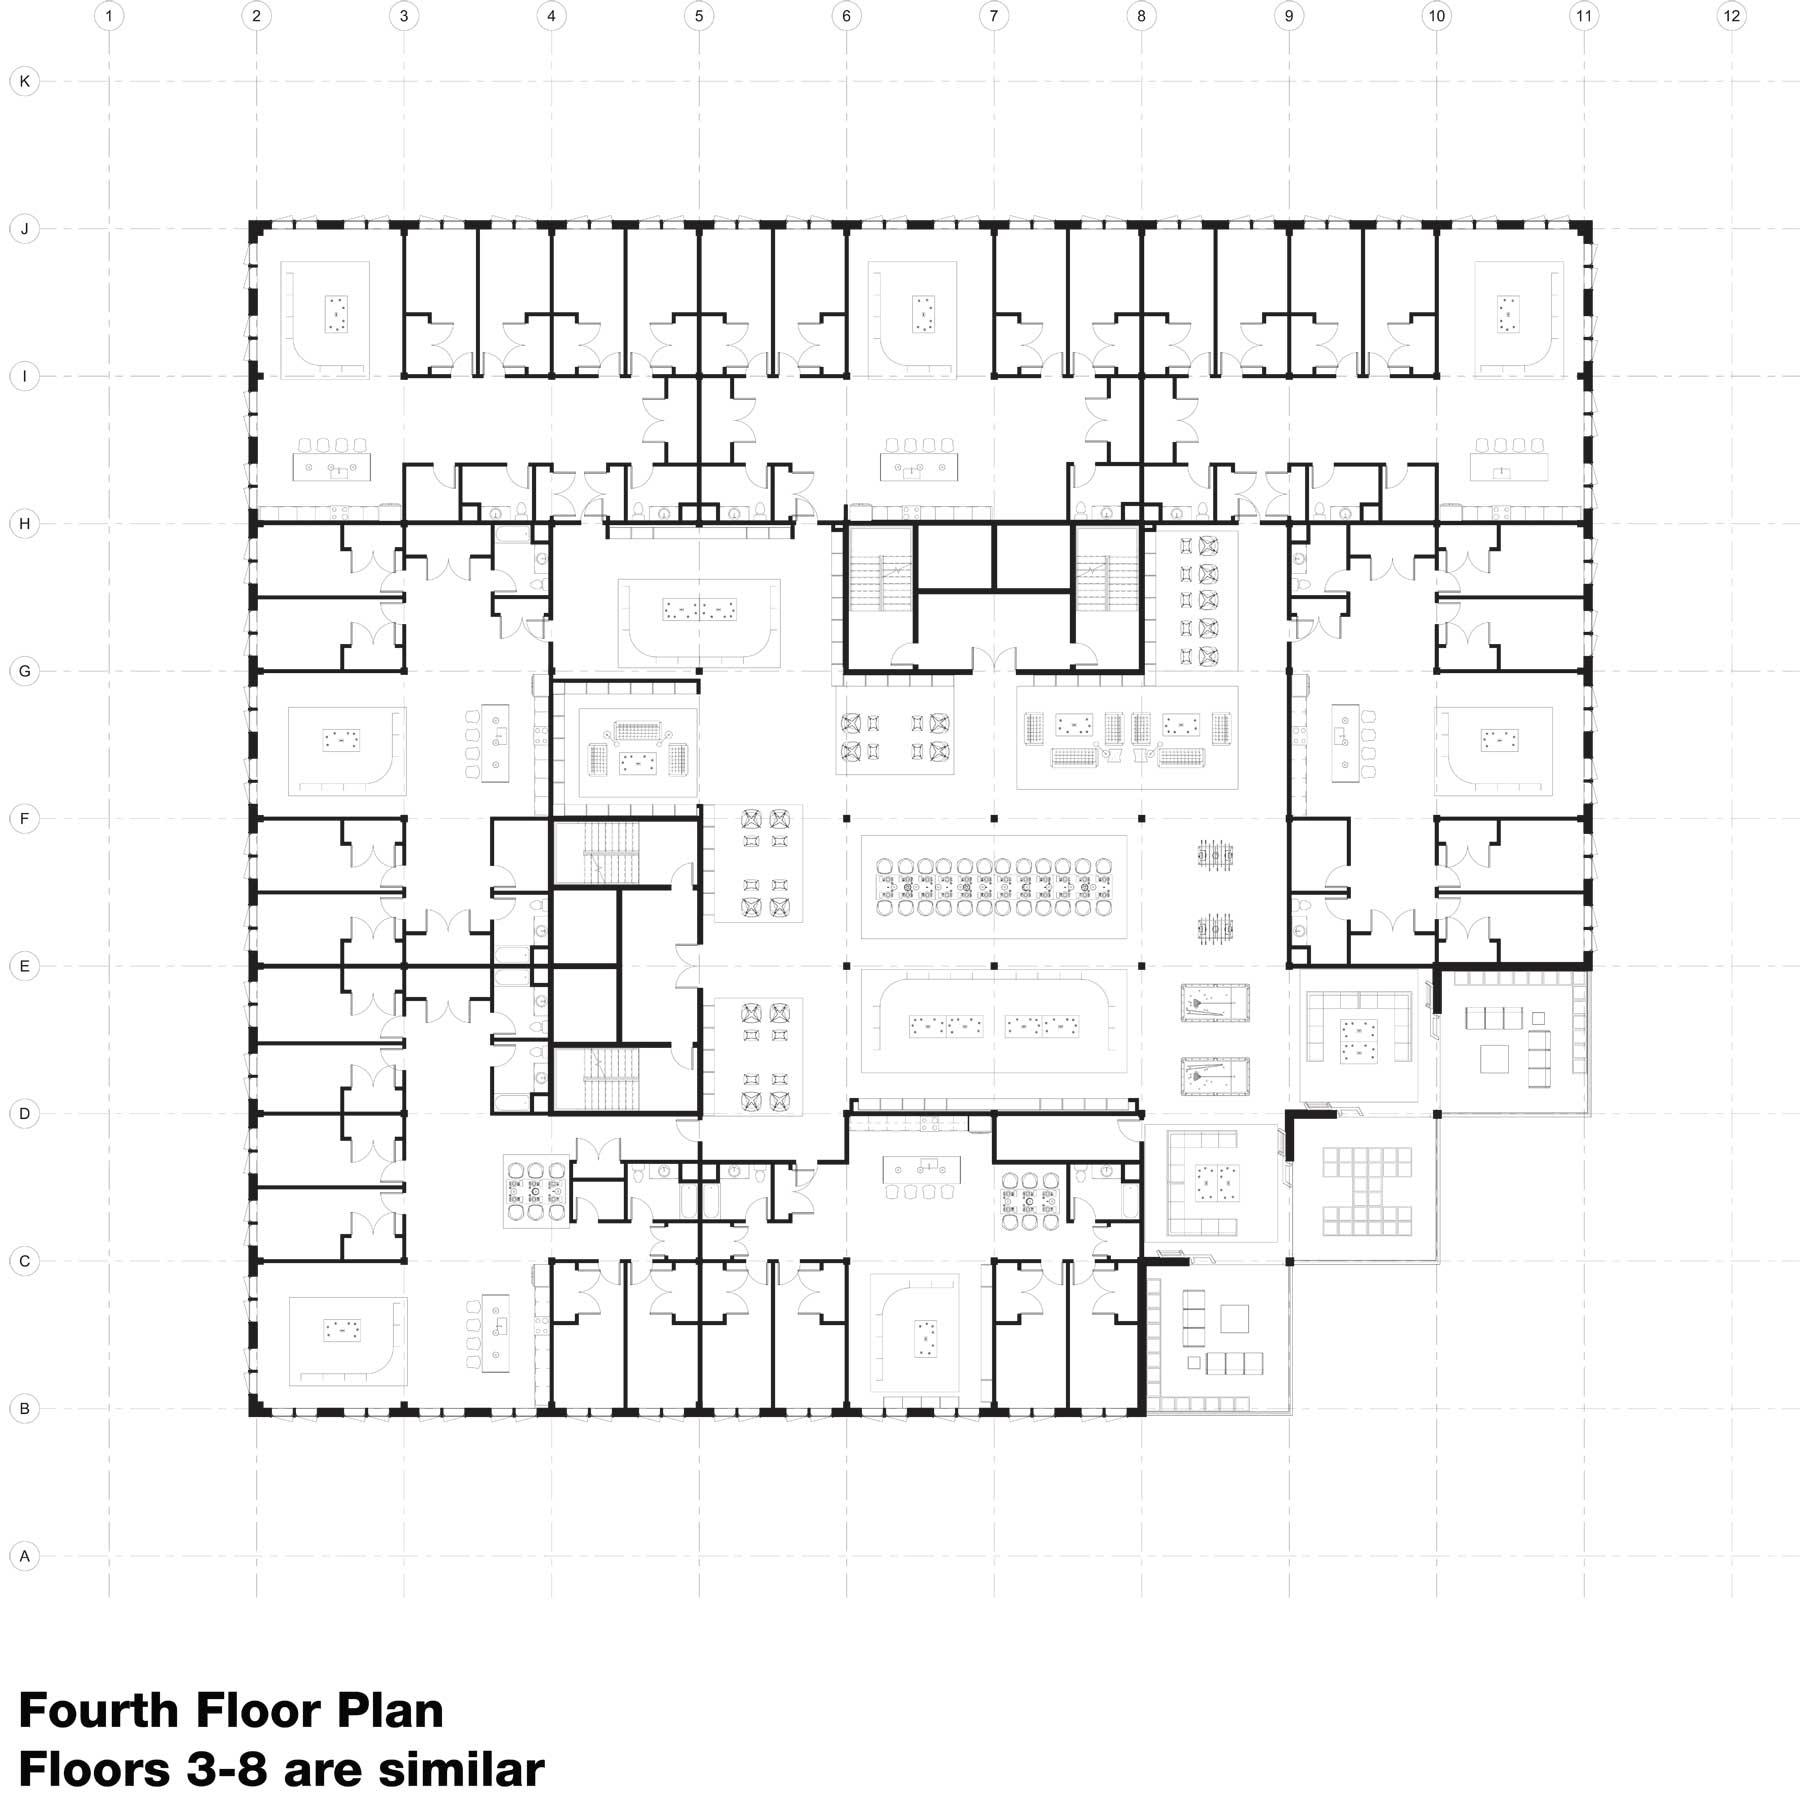 30x30-Intergenerational-Co-Living-4th-Floor-Plan.jpg